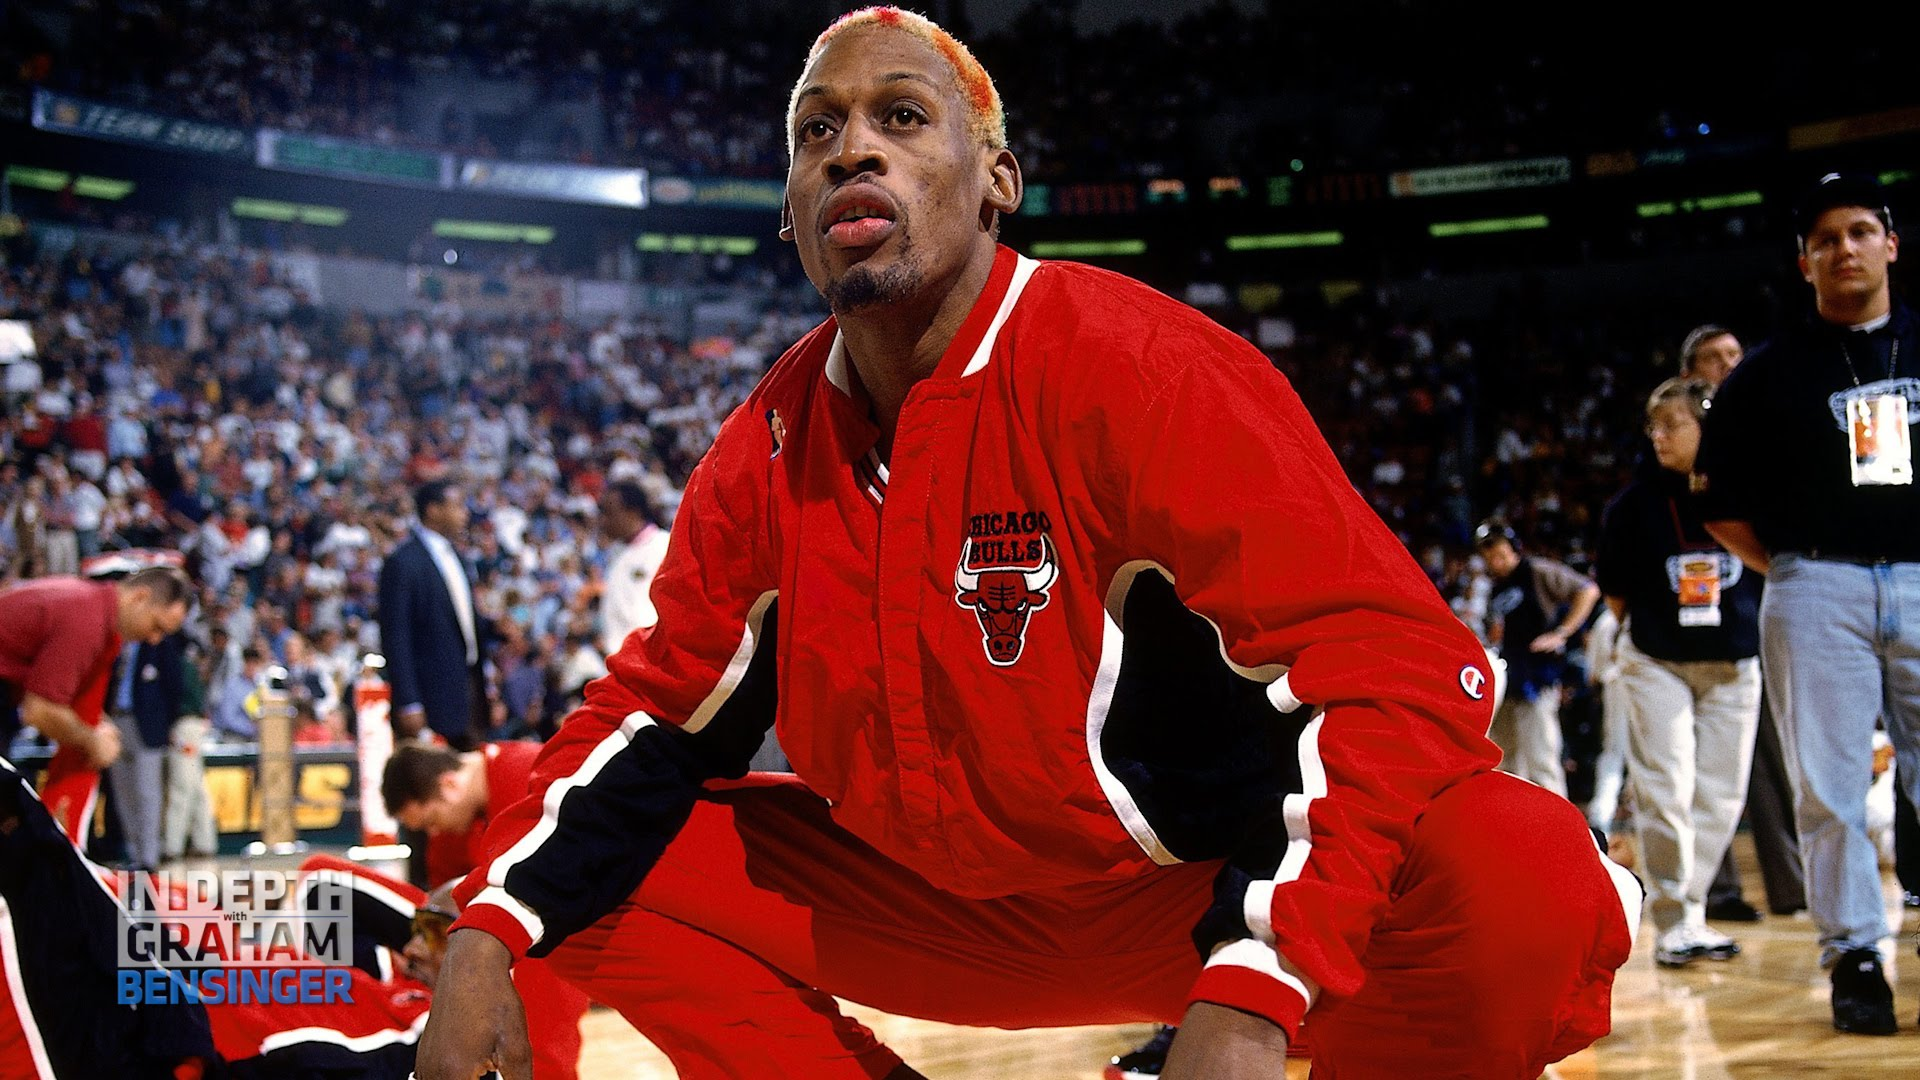 Dennis Rodman says he never talked to Michael Jordan or Scottie Pippen